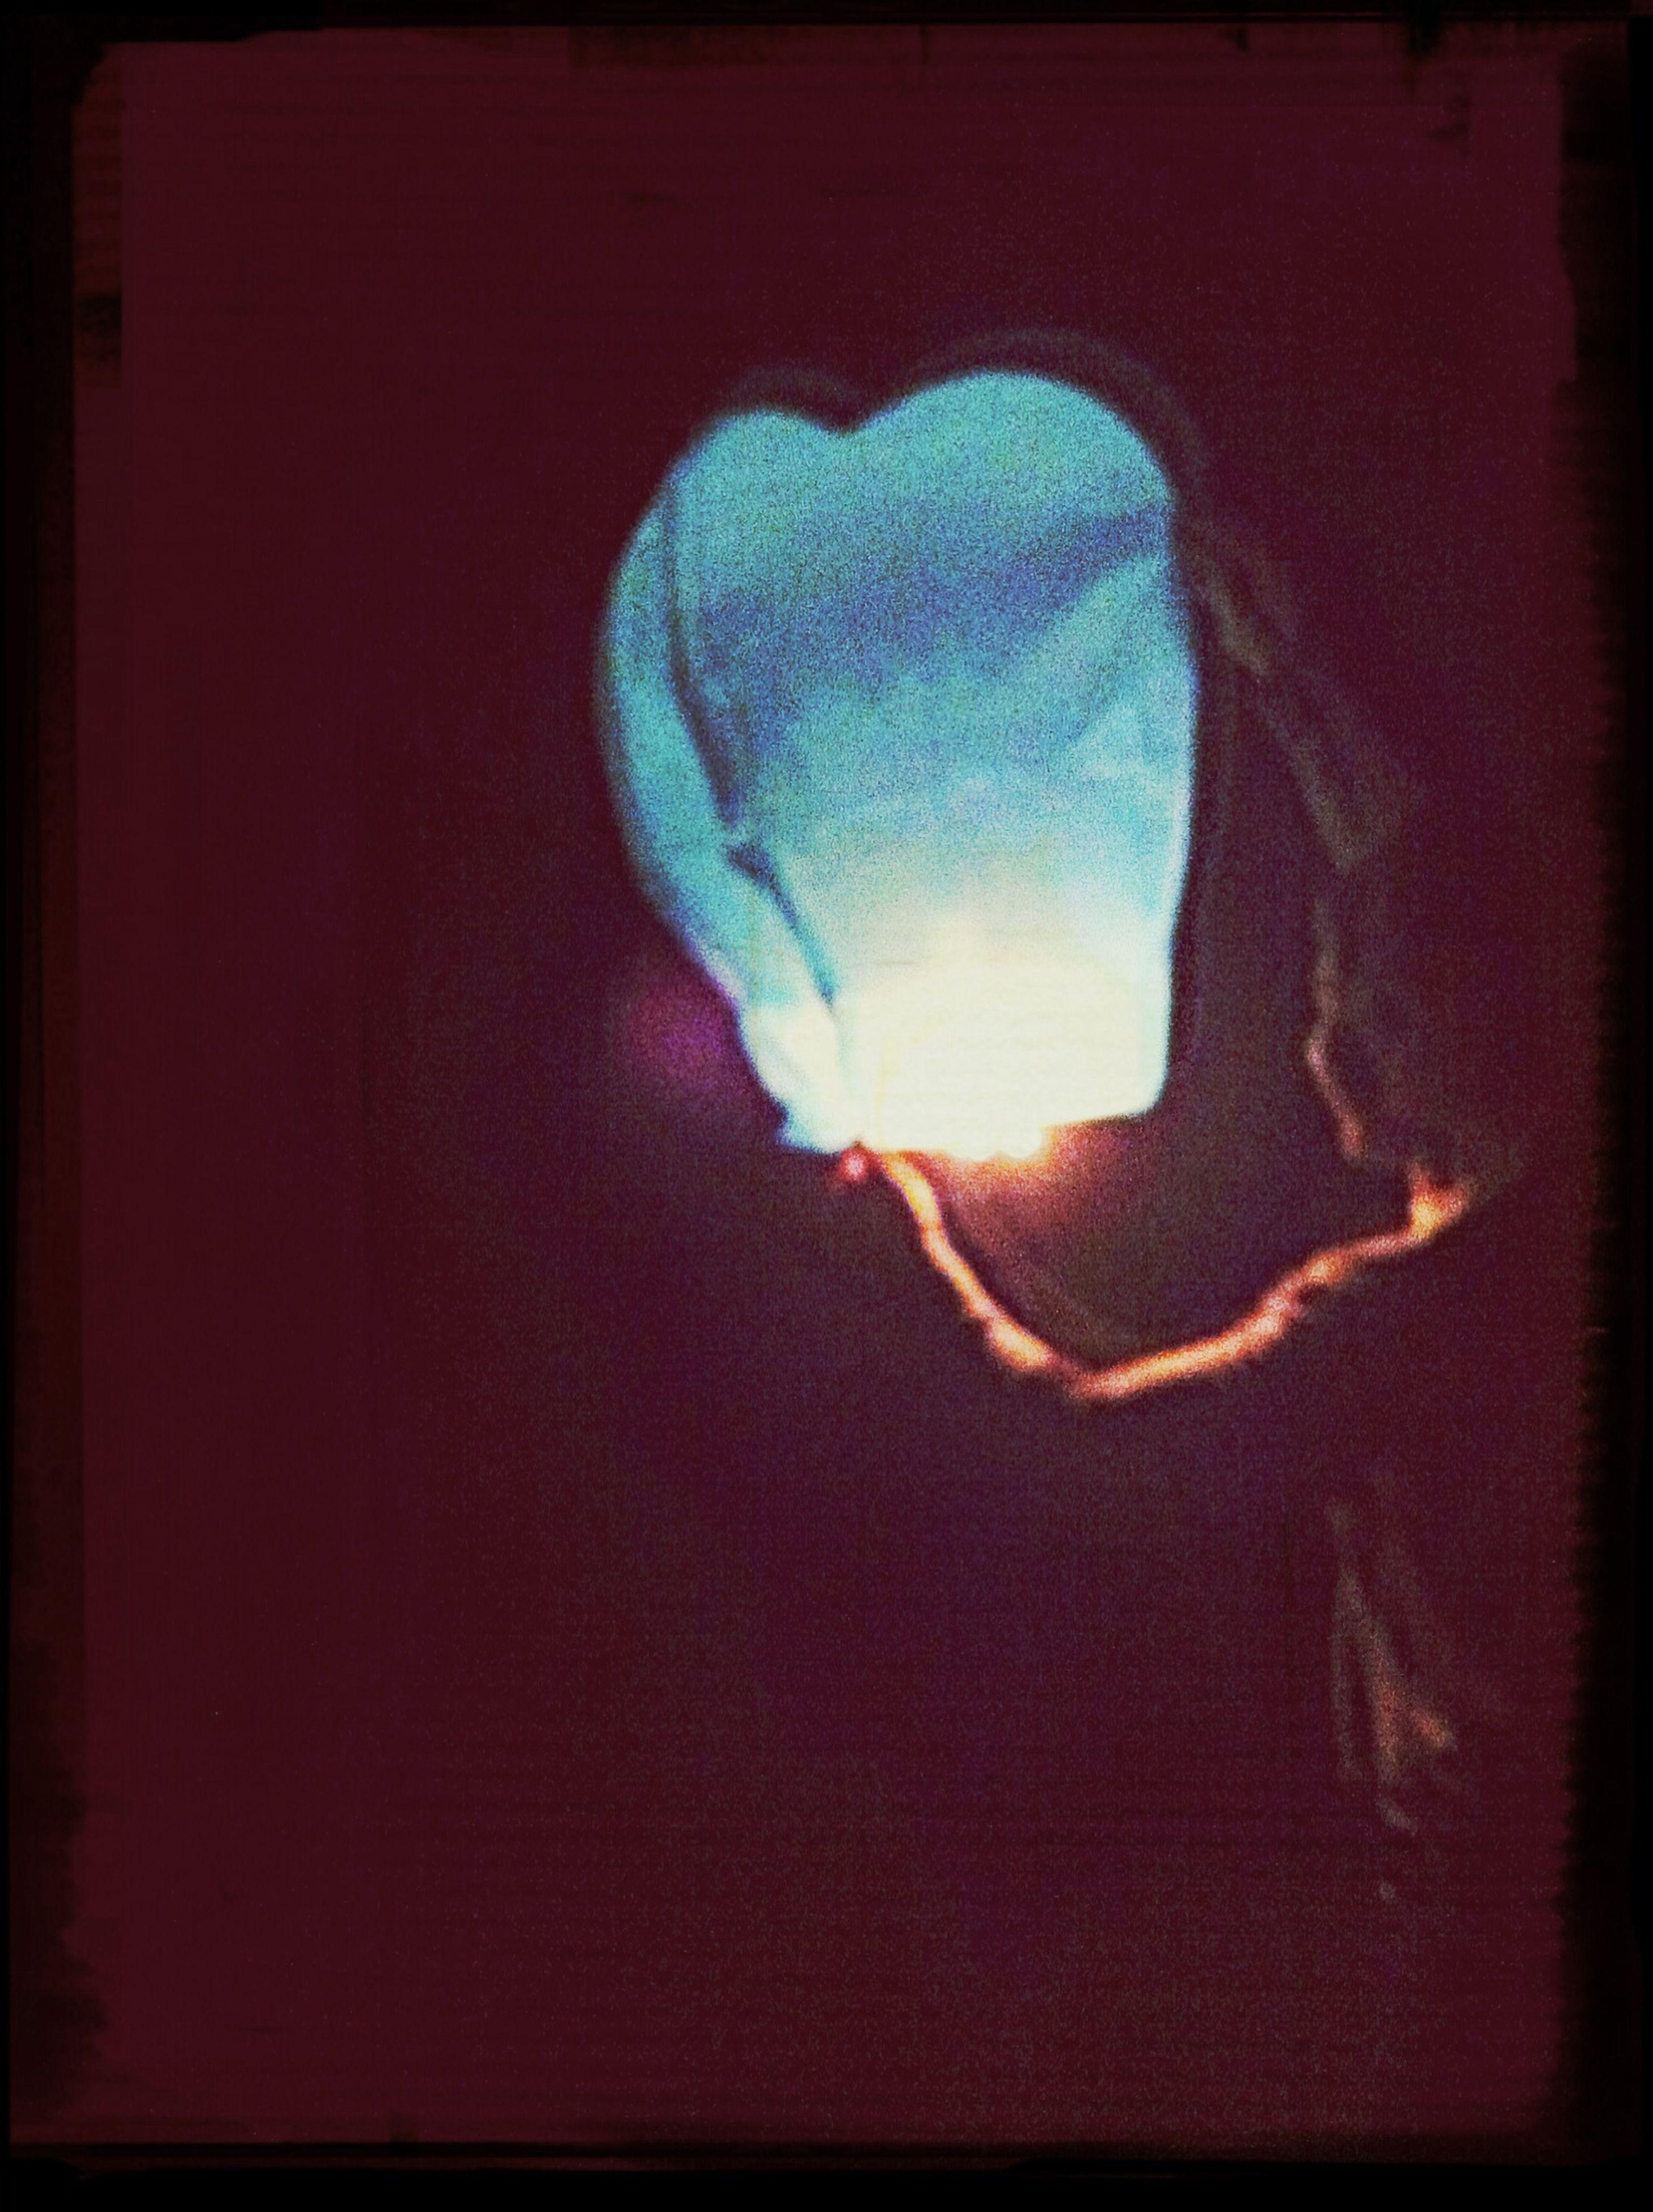 transfer print, auto post production filter, indoors, glowing, flame, person, night, close-up, burning, dark, heat - temperature, unrecognizable person, fire - natural phenomenon, men, light - natural phenomenon, illuminated, lifestyles